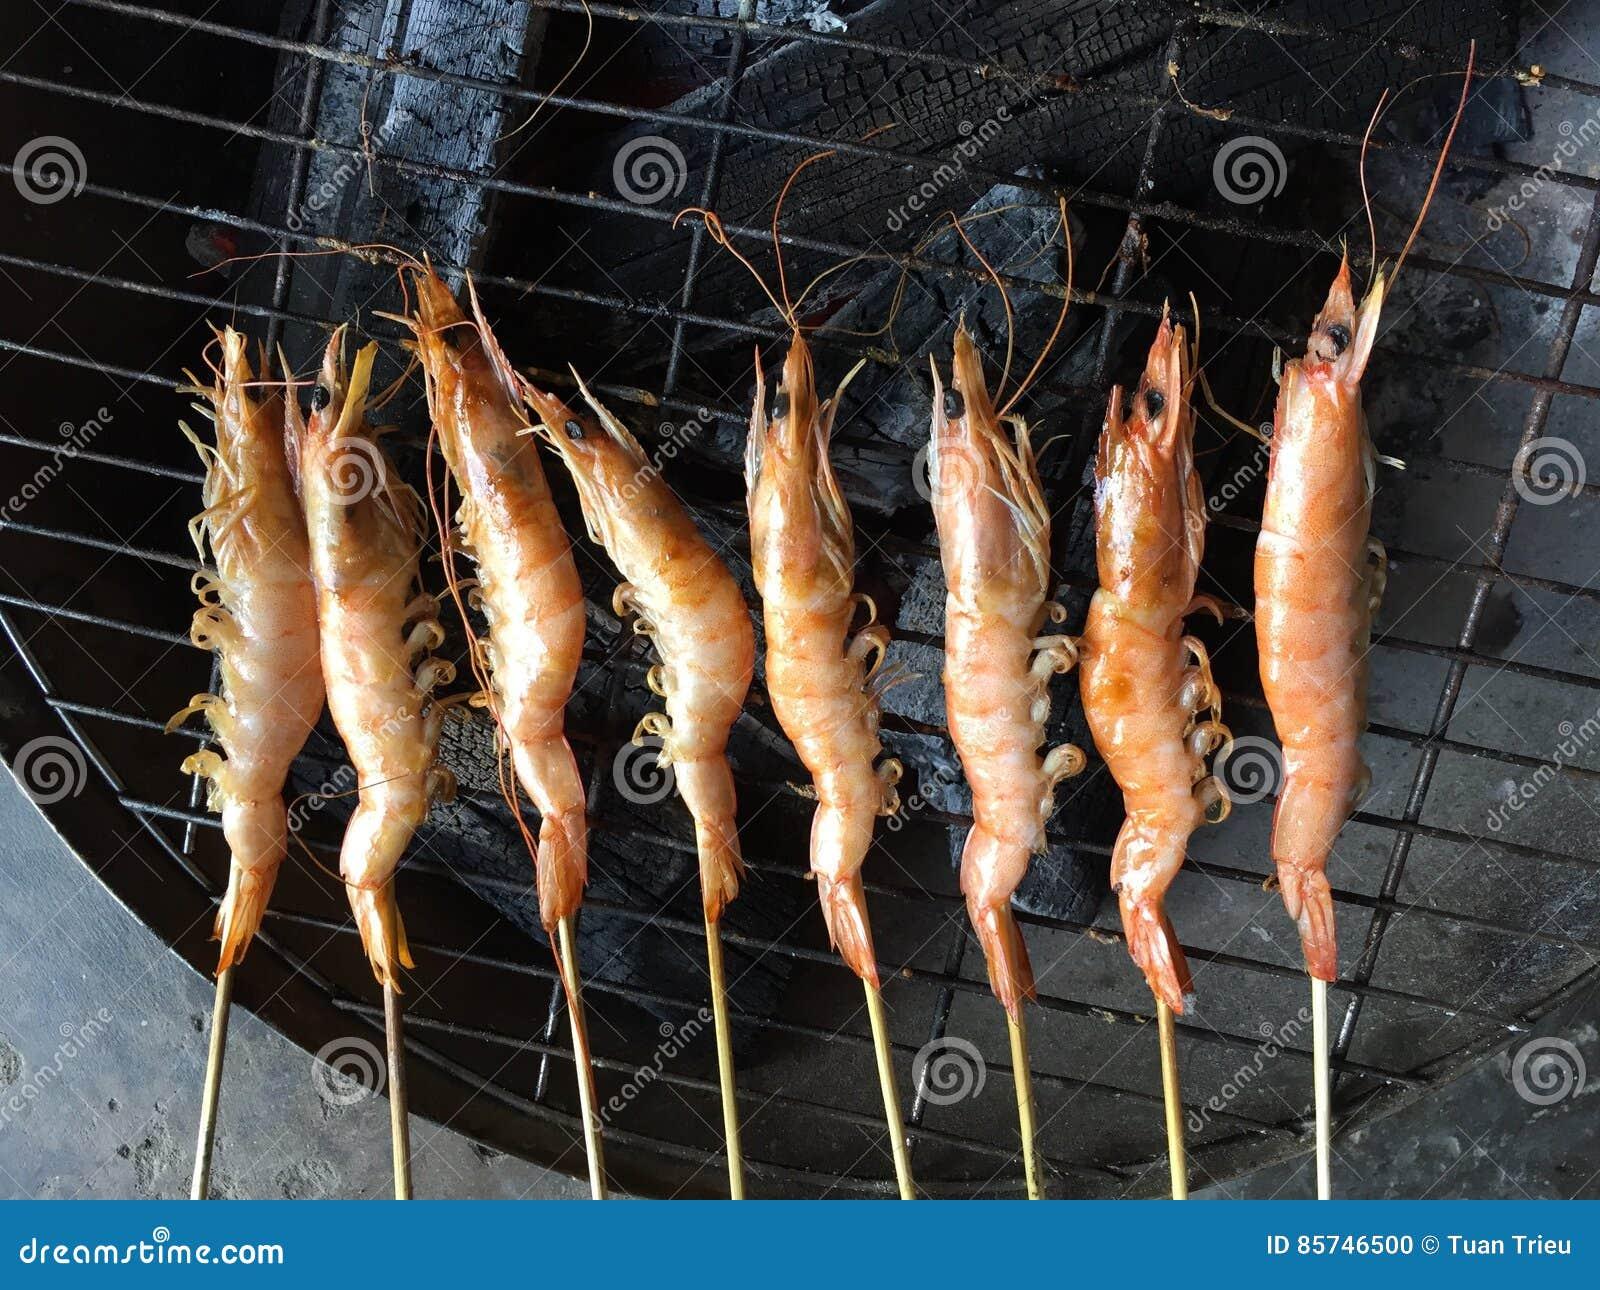 Vietnamese cuisine: grilled shrimp